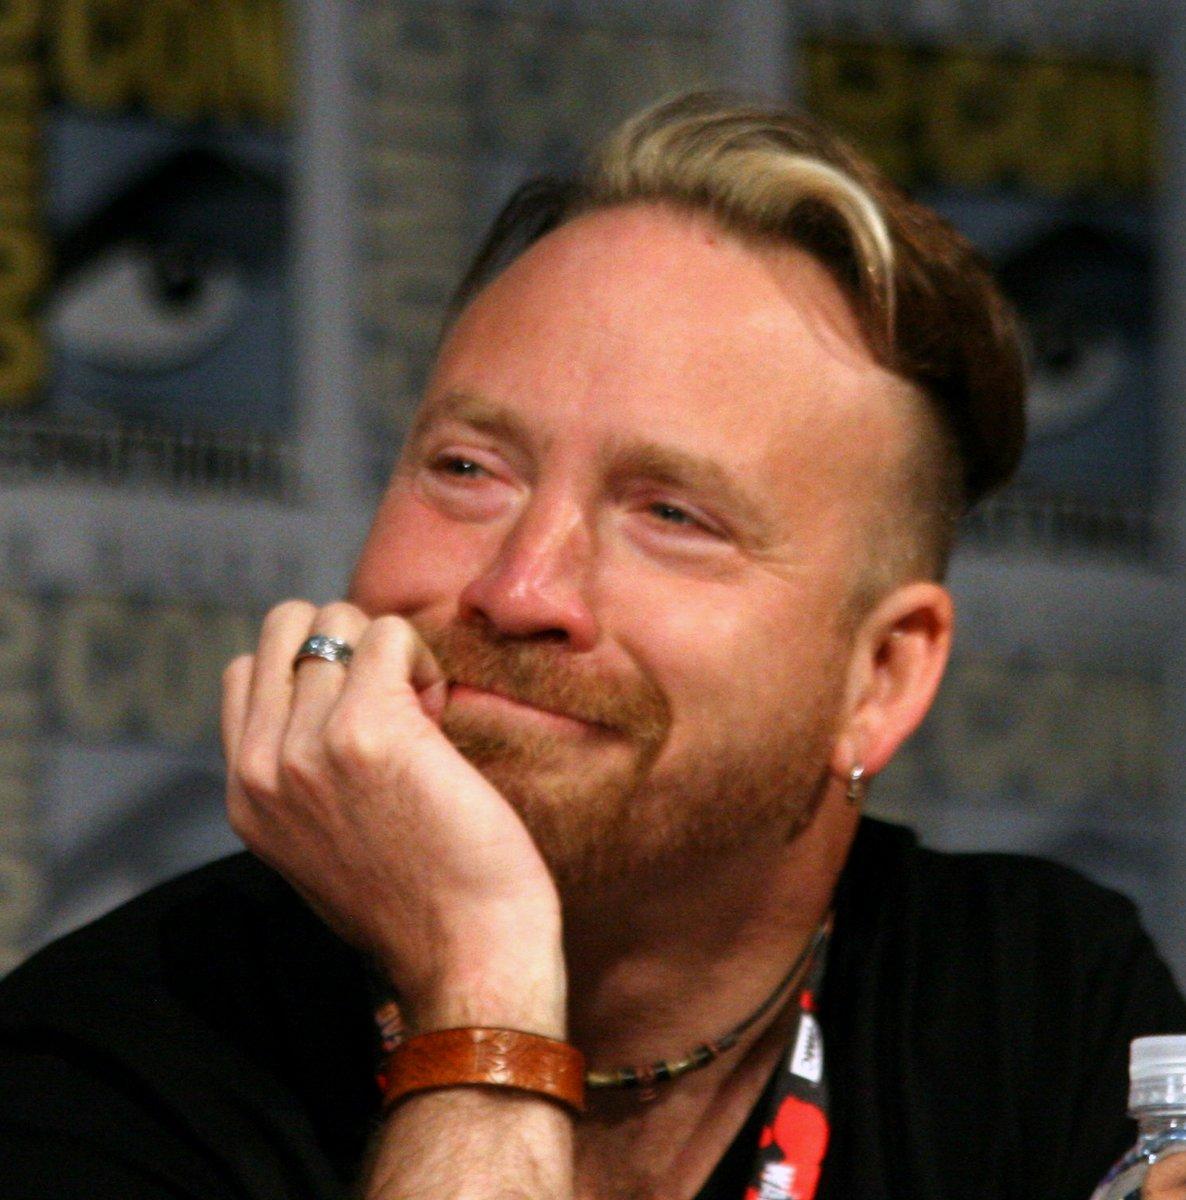 Trevor Devall Wikipedia